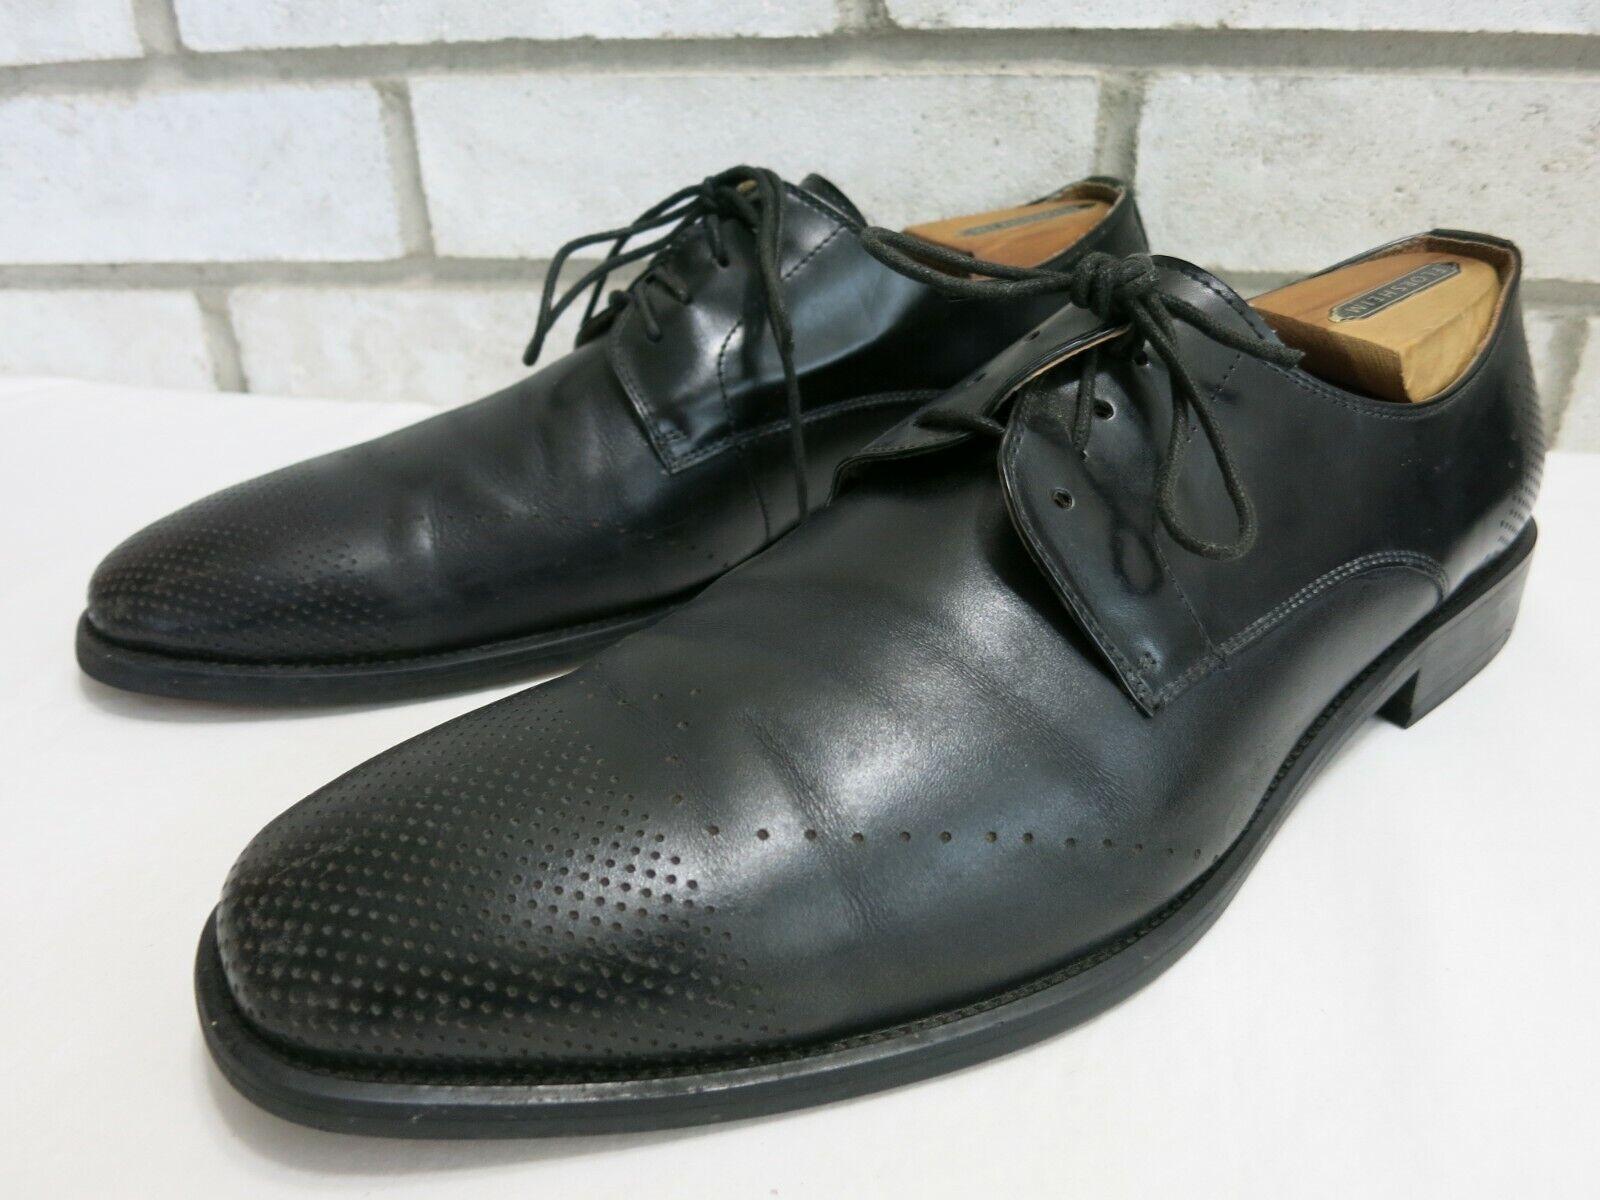 Kenneth Cole Reaction Leather Dress Shoes Estate Footwear Shoe Zapato Kutsu 10.5